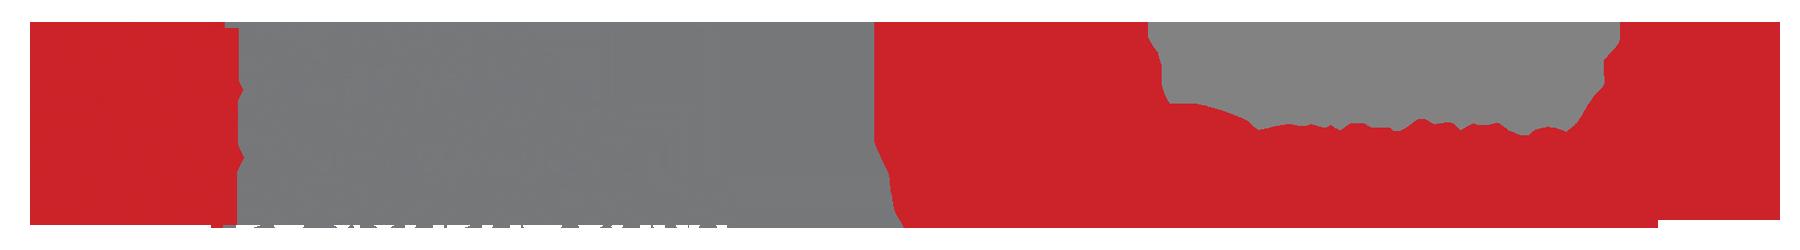 Logos editoriales.png